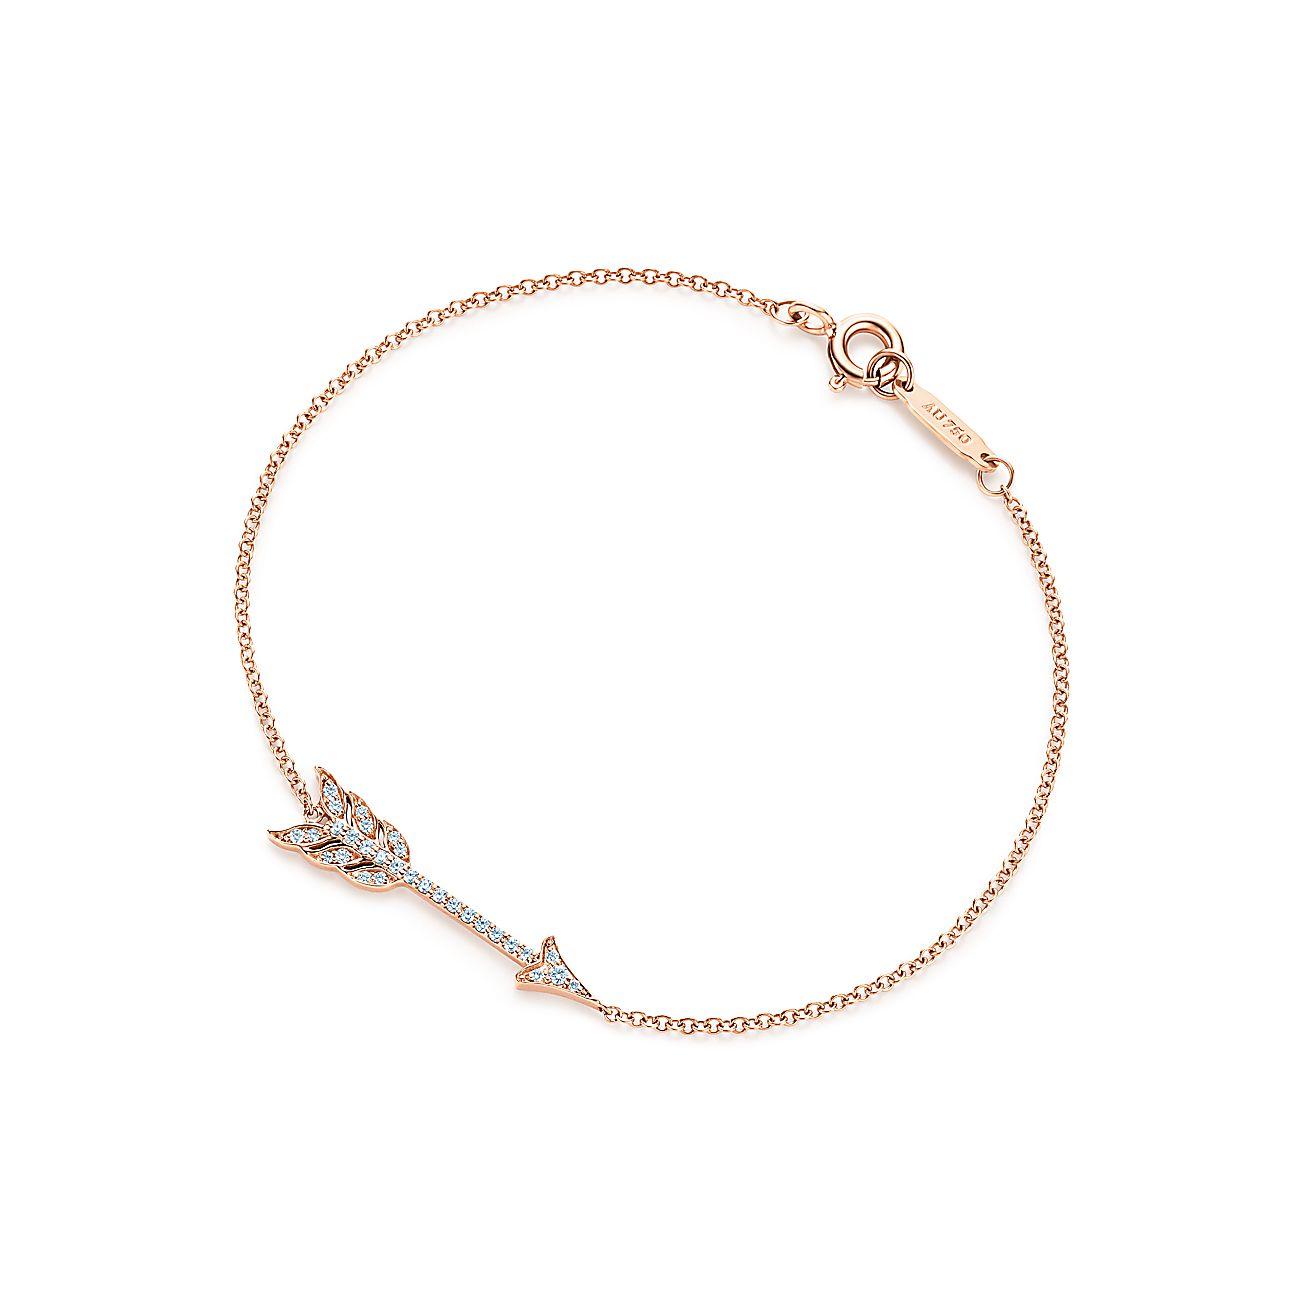 tiffany hearts arrow bracelet in 18k rose gold with diamonds small